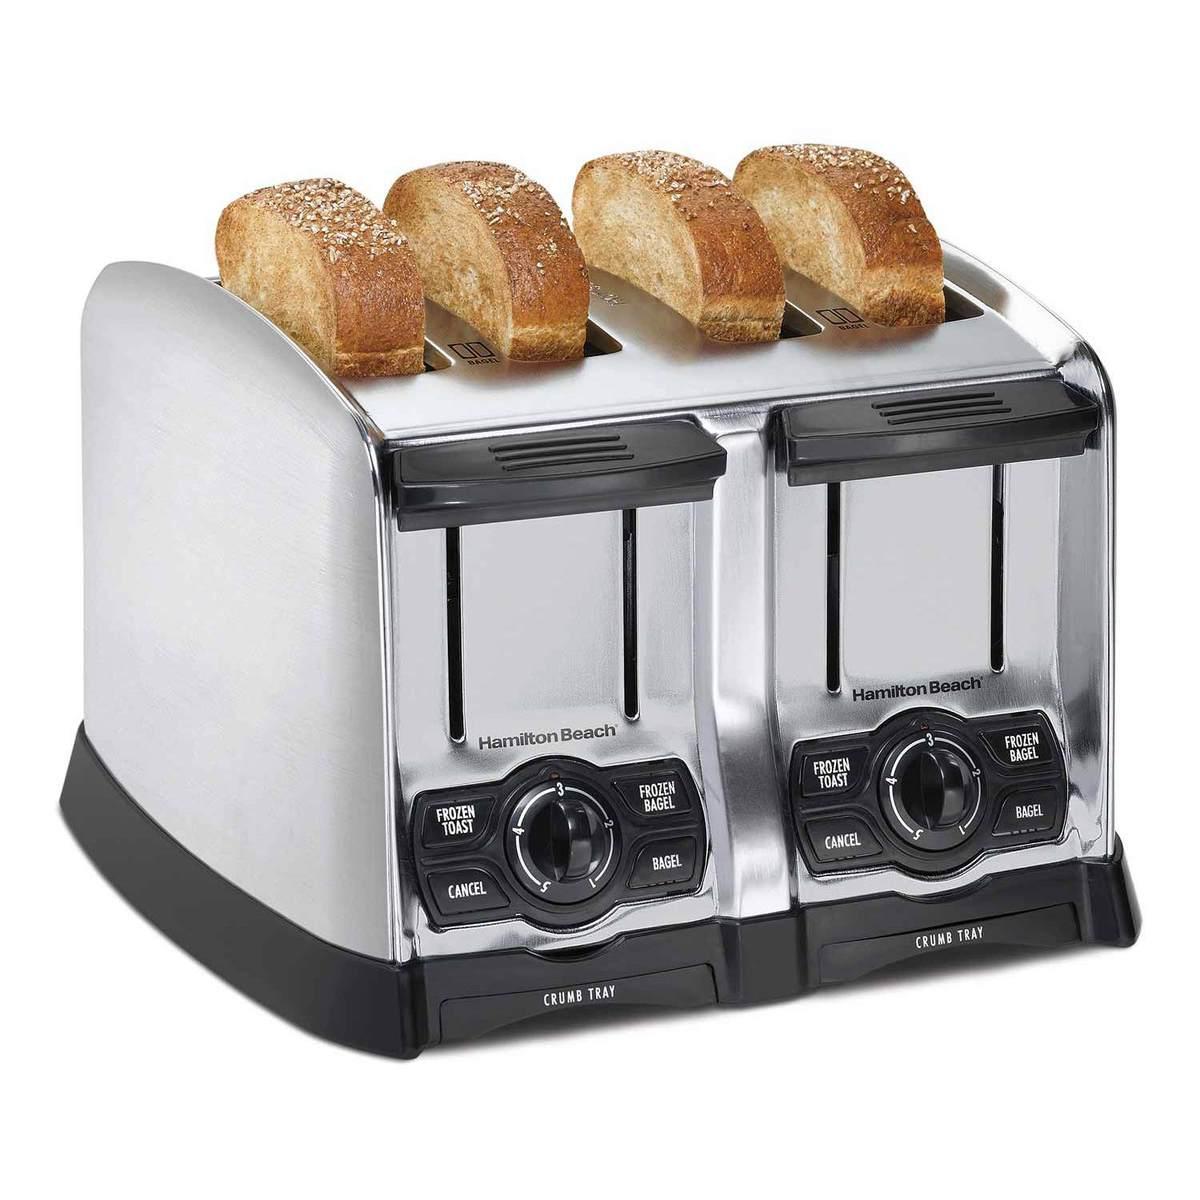 PerfectToast Chrome 4 Slice Toaster (24800)